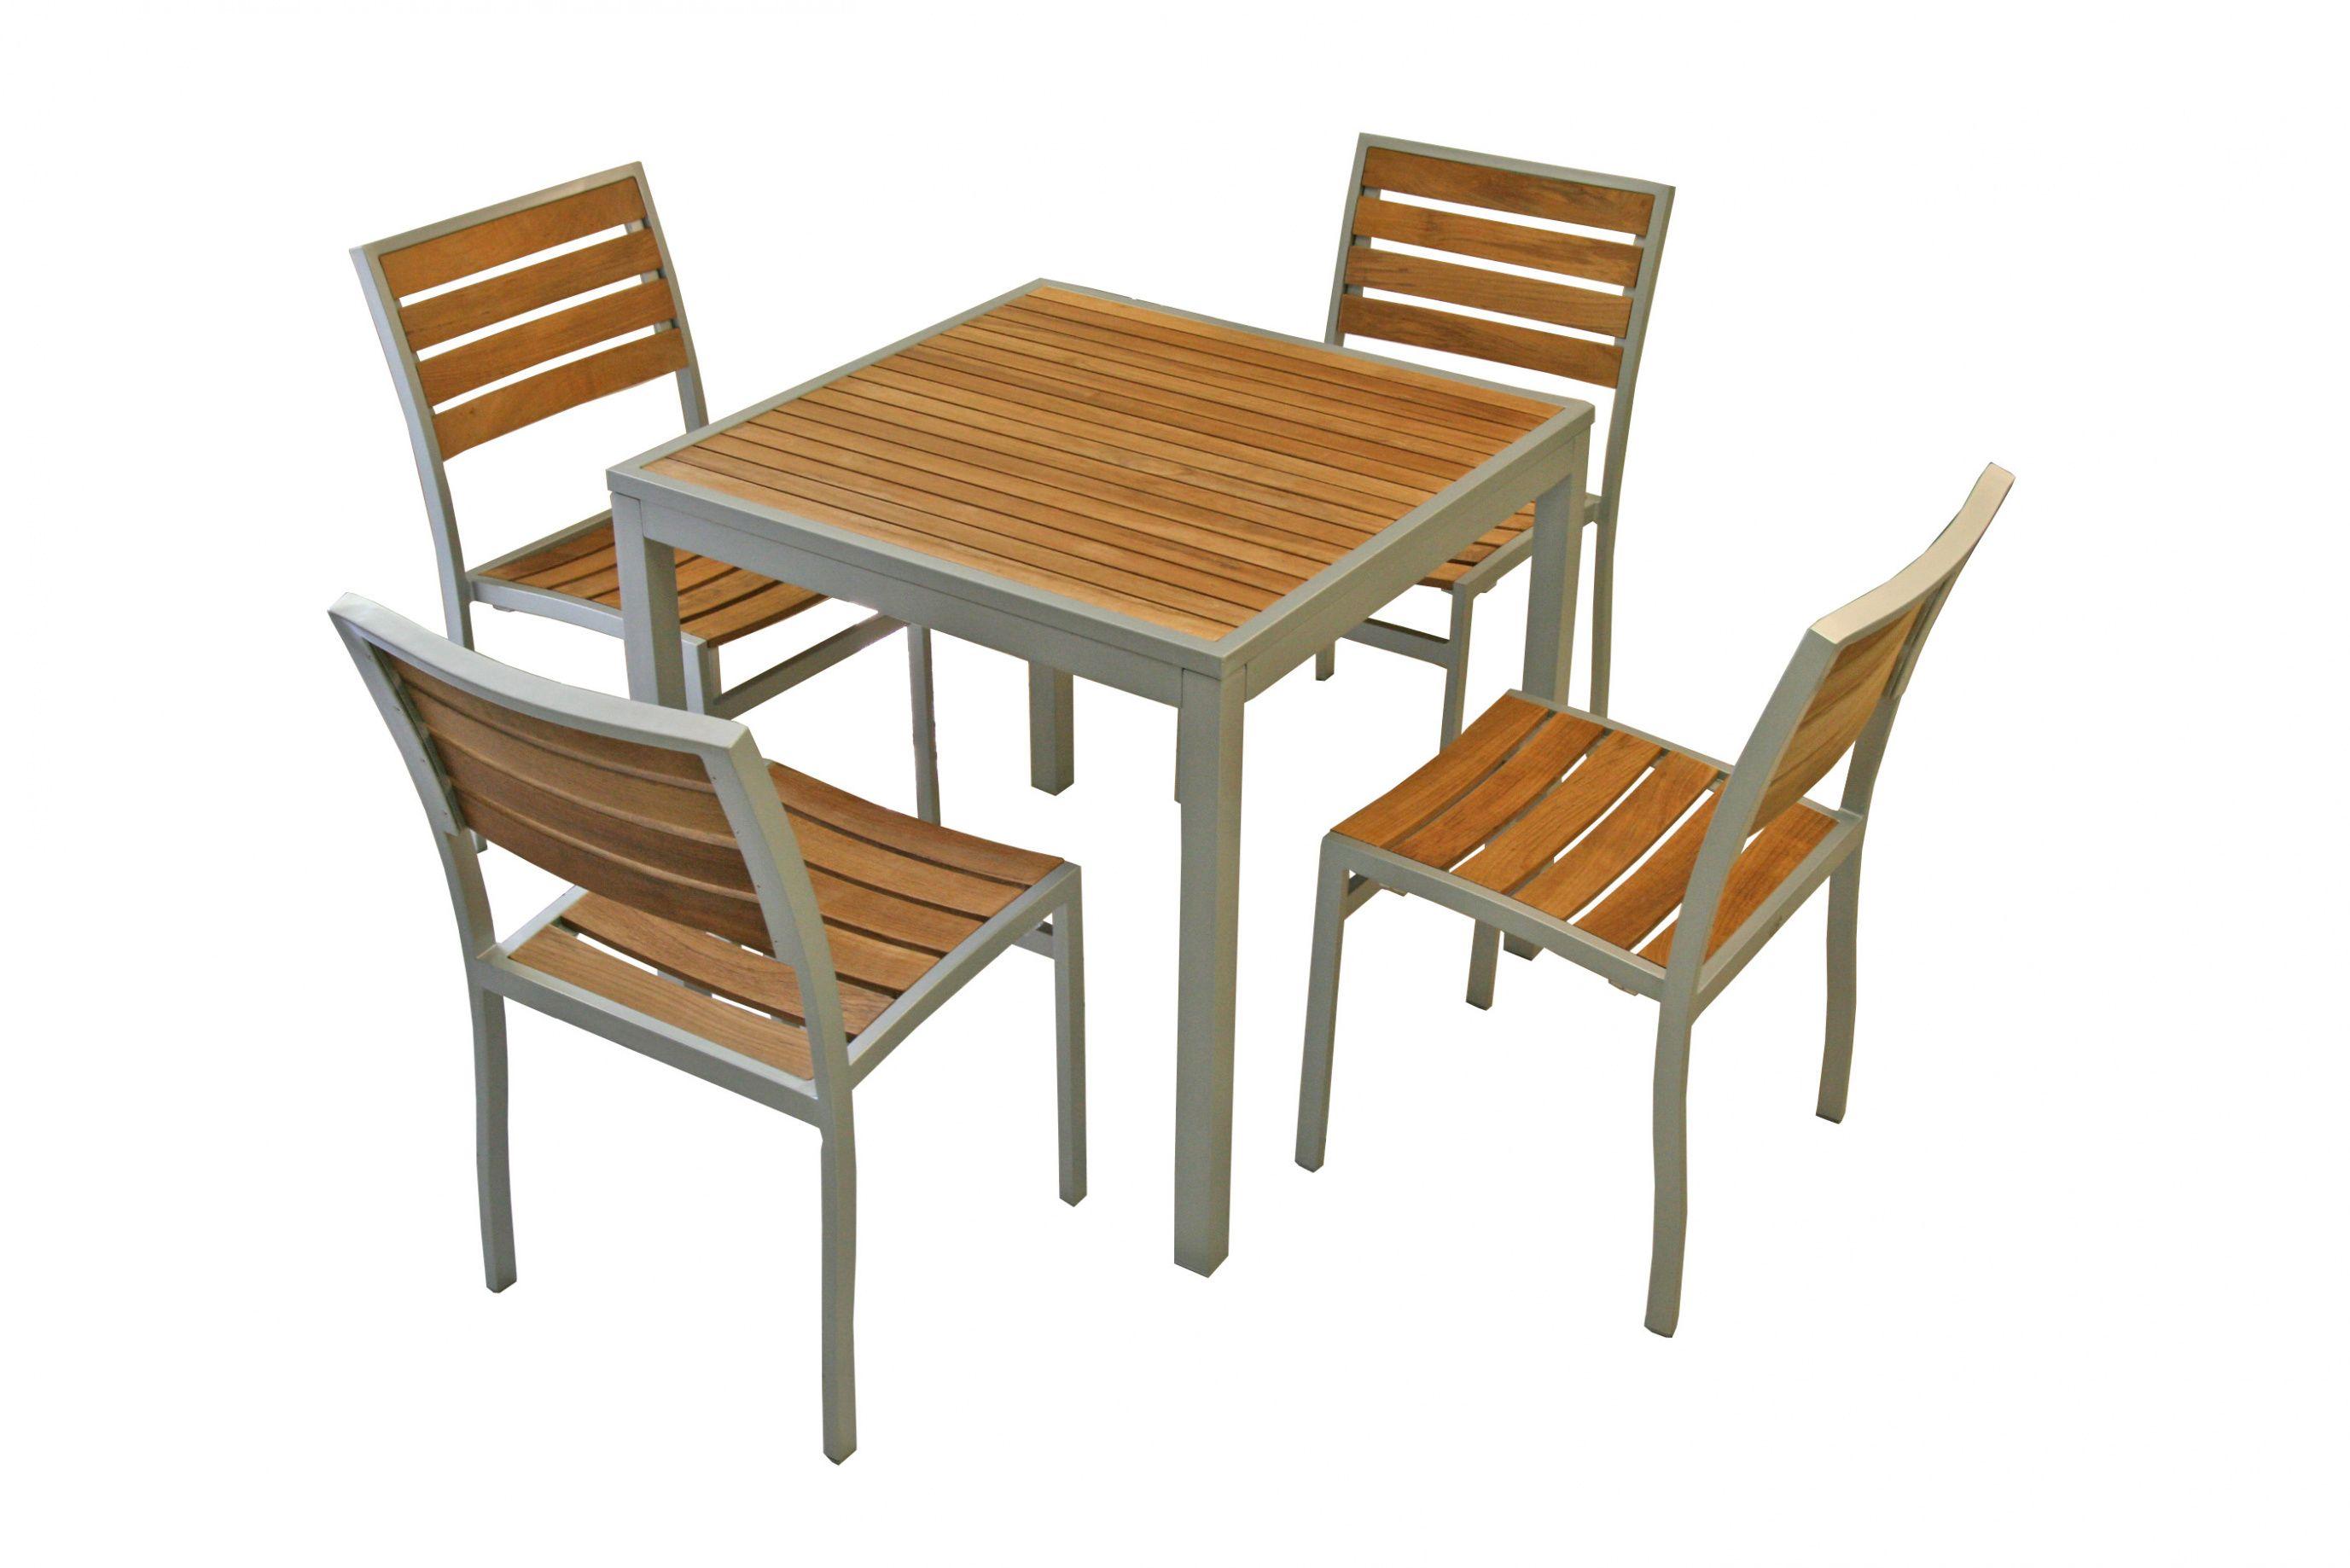 outdoor restaurant furniture wholesale best master furniture check rh pinterest com outdoor restaurant furniture supply Art Outdoor Furniture